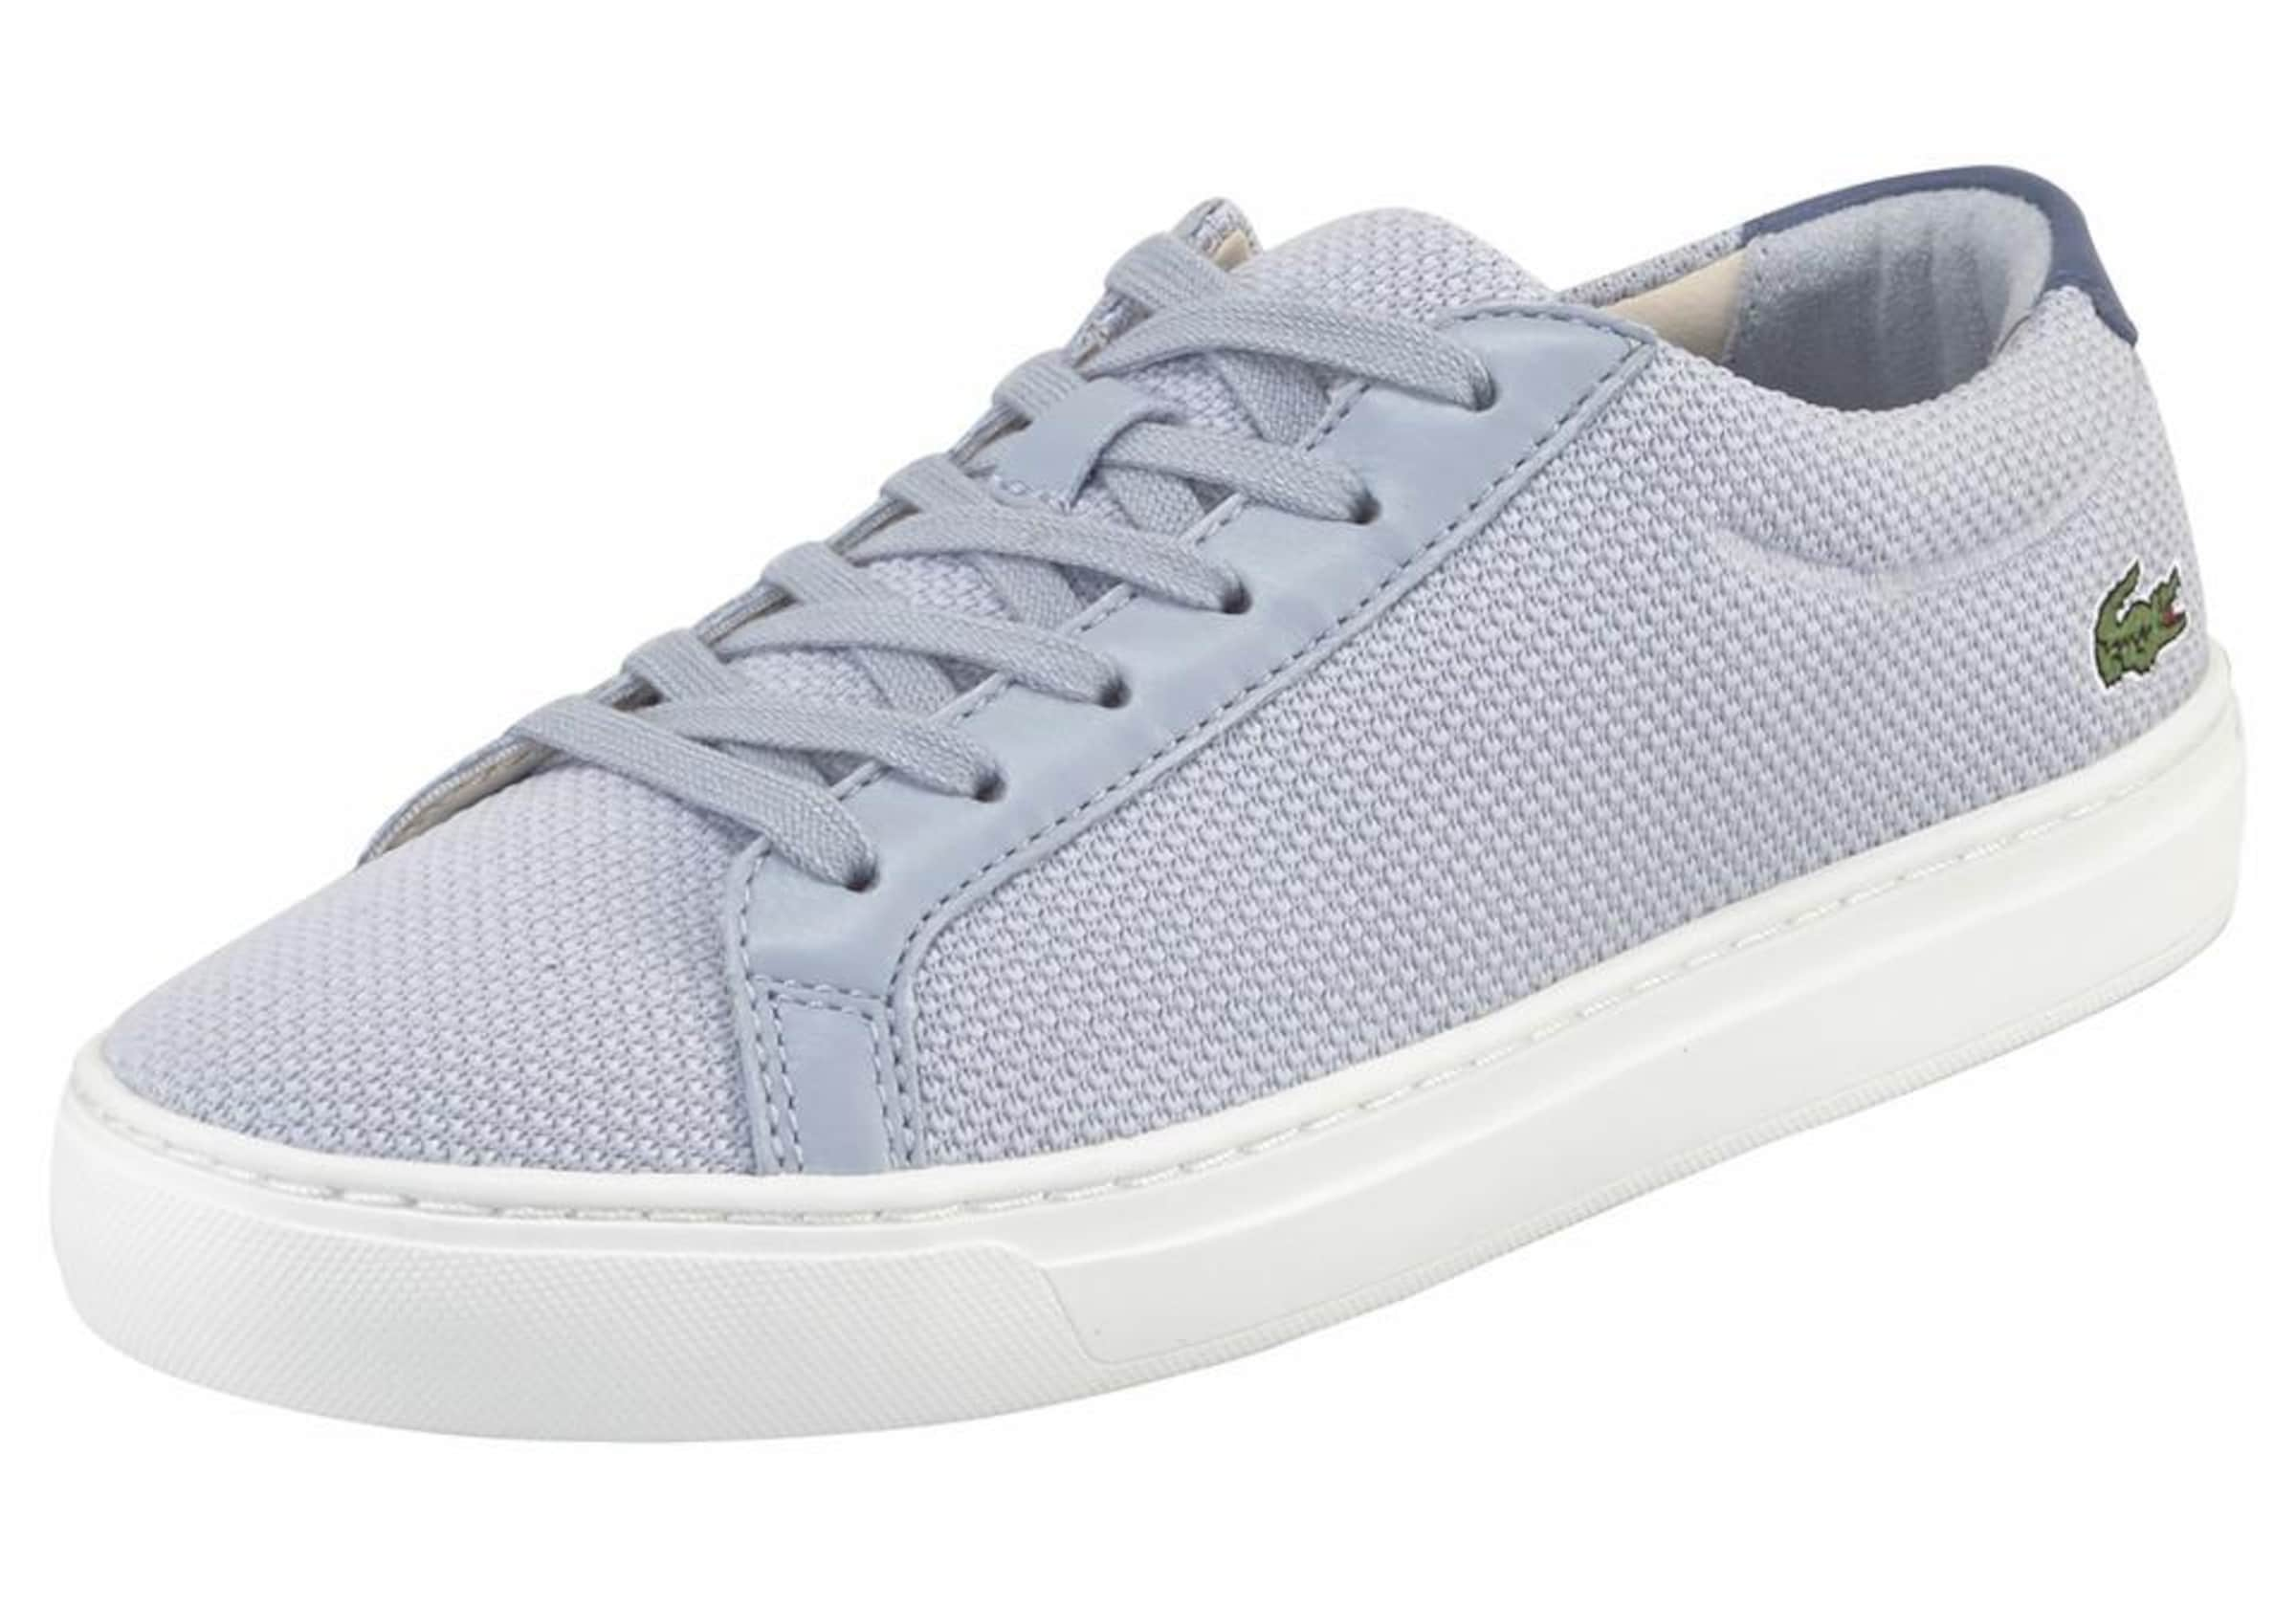 Chaussures De Sport Lacoste »l-12-12 117 2 Caw« Ki3uva